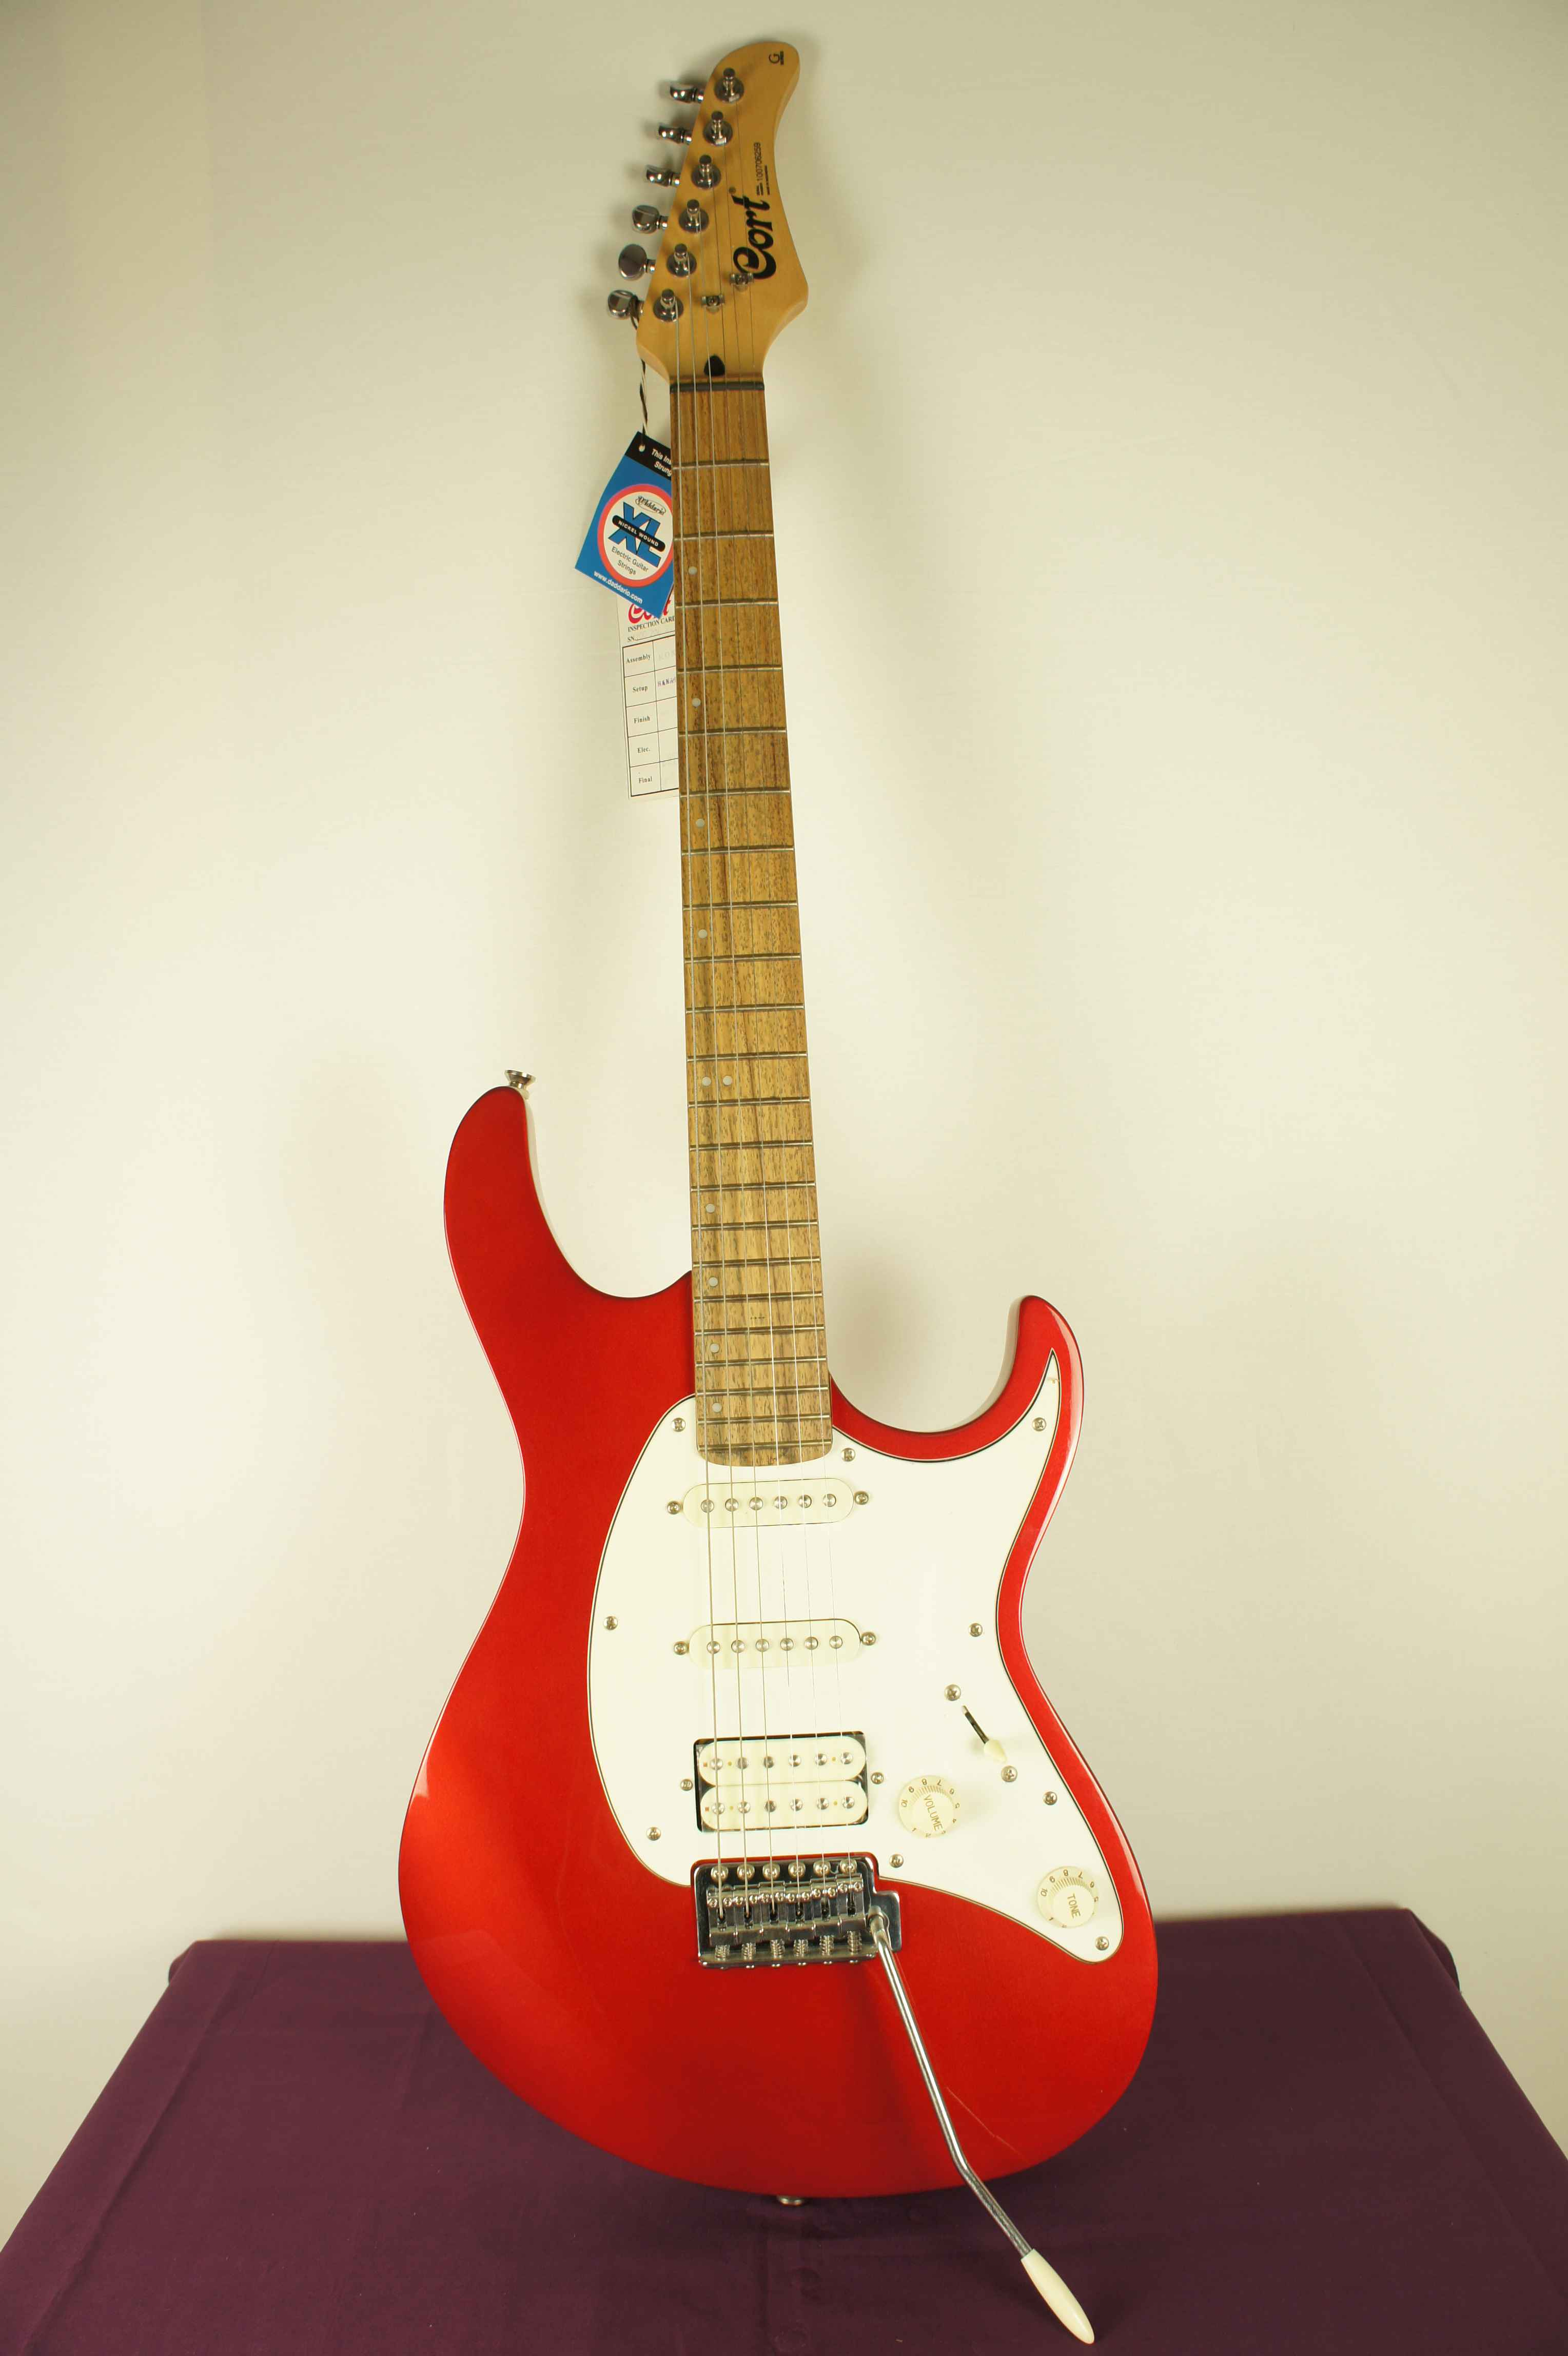 elektro_gitar_kirmizi_cort_en_ucuz_fiyatli_gitar_G210RM_1